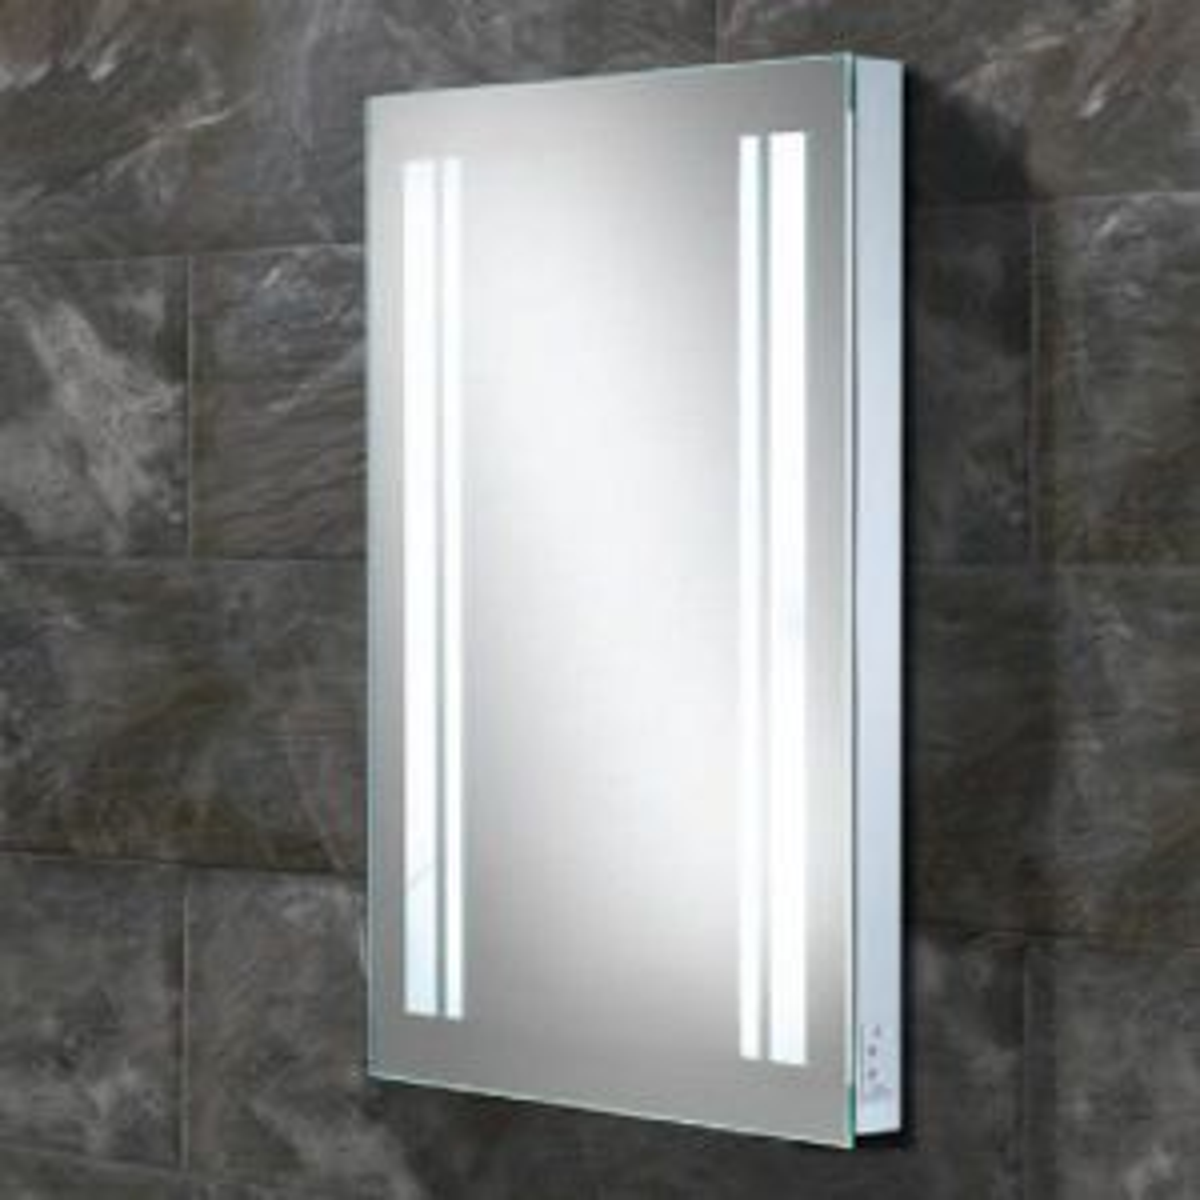 HiB Nexus Portrait LED Back-Lit Bathroom Mirror